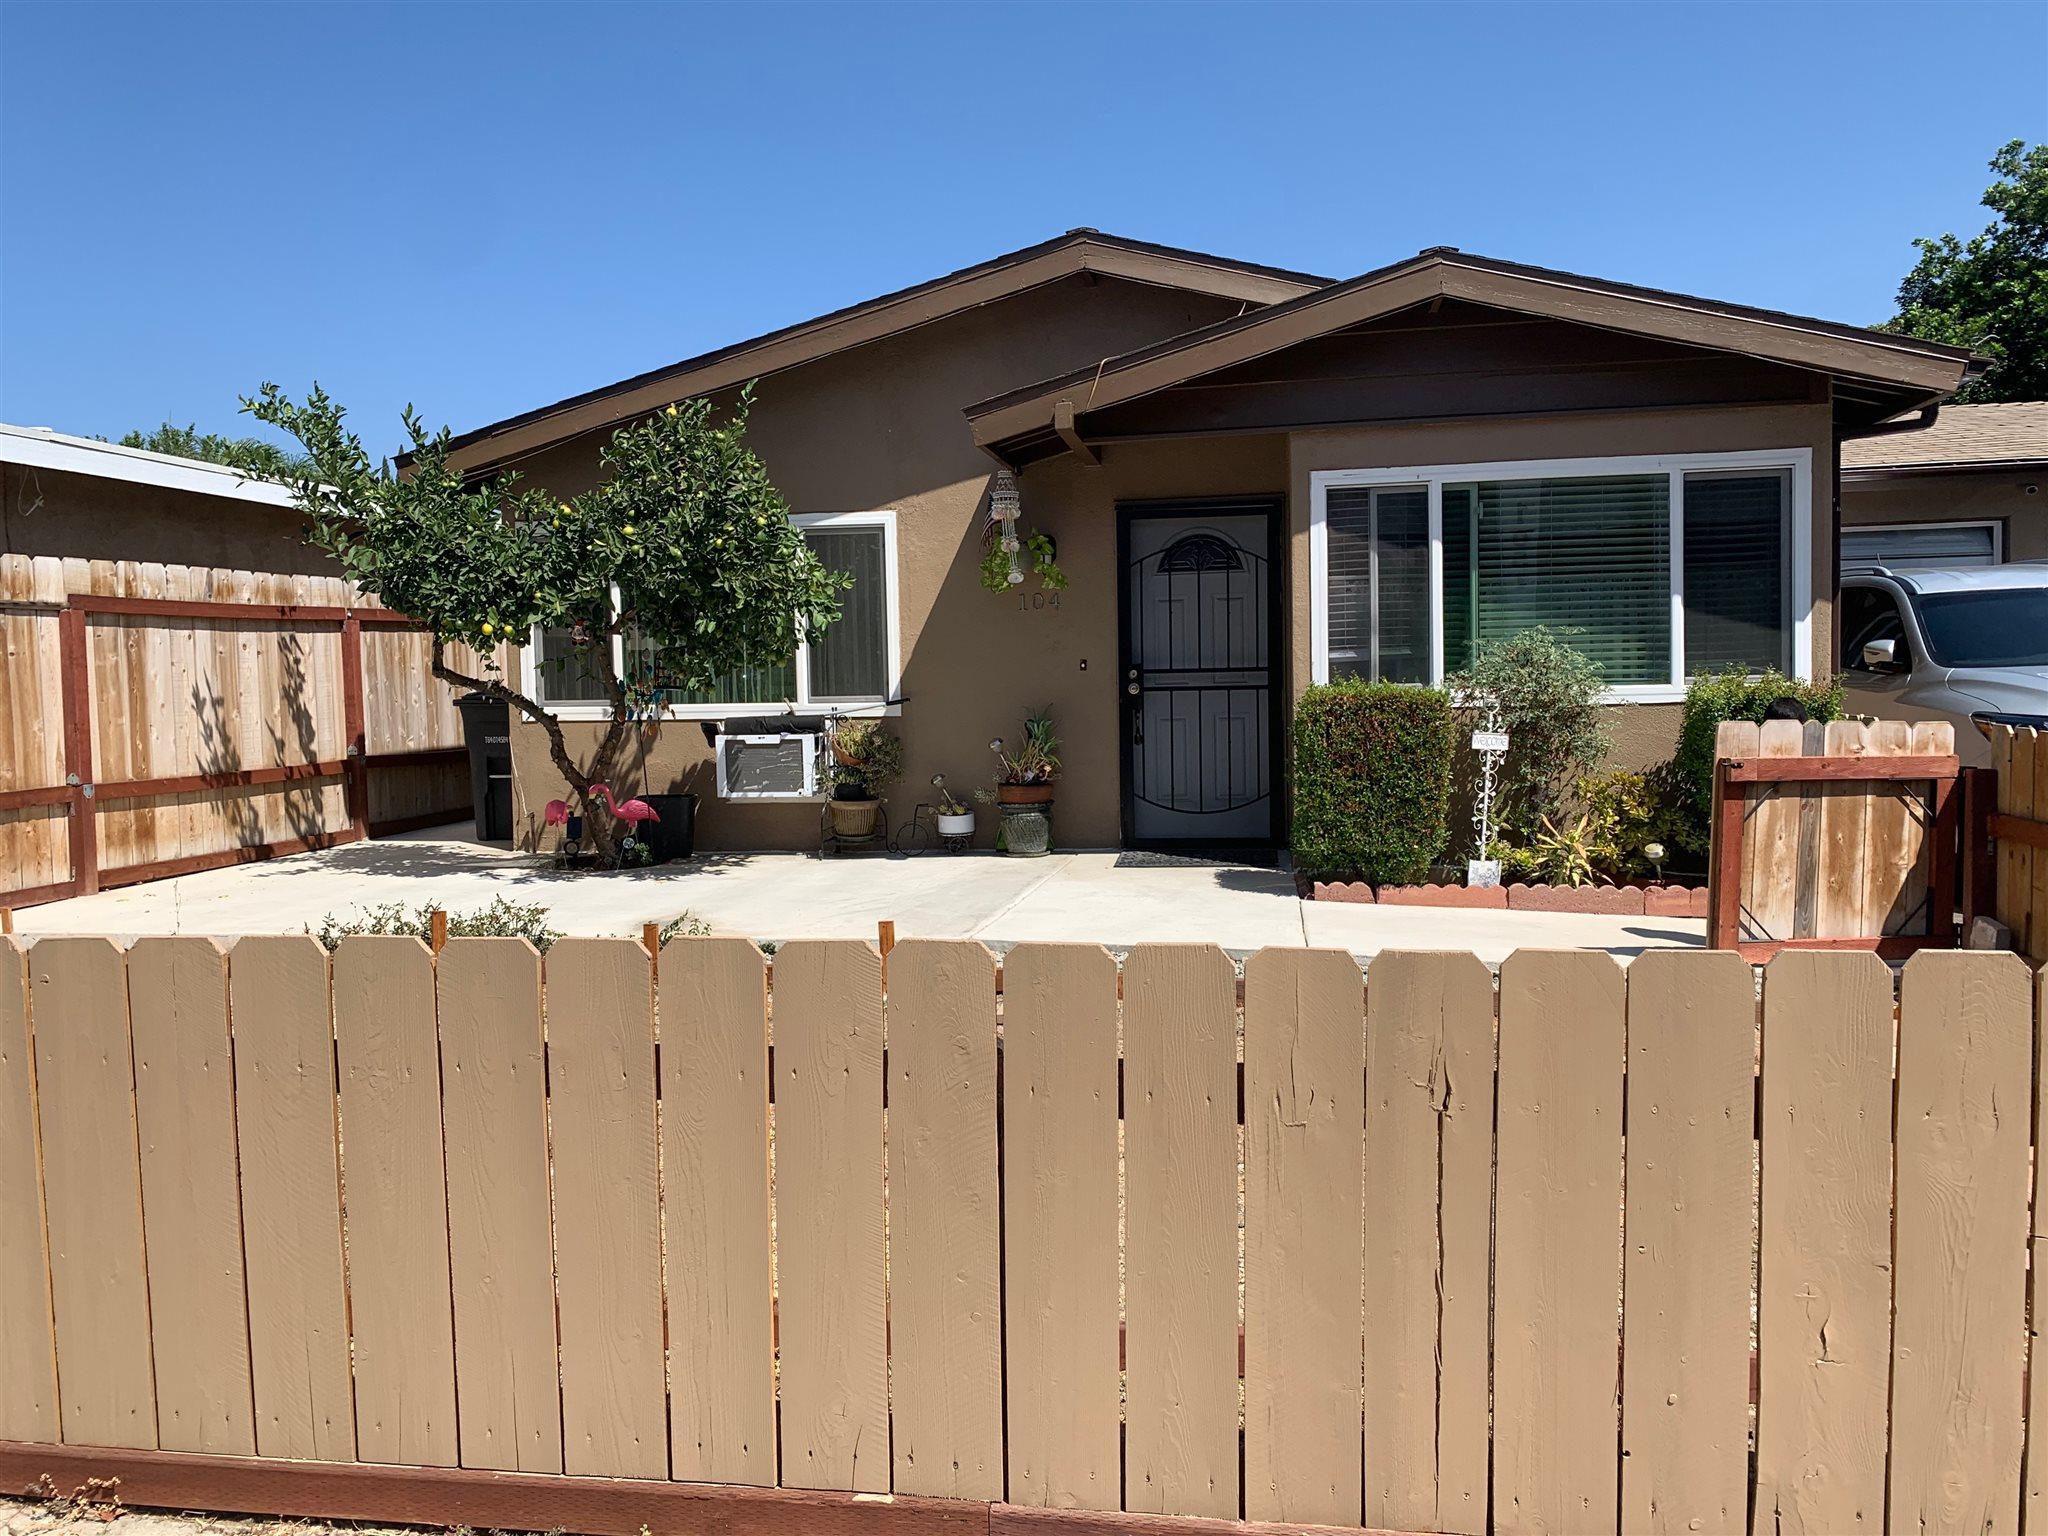 104 N Rose St., Escondido, CA 92027